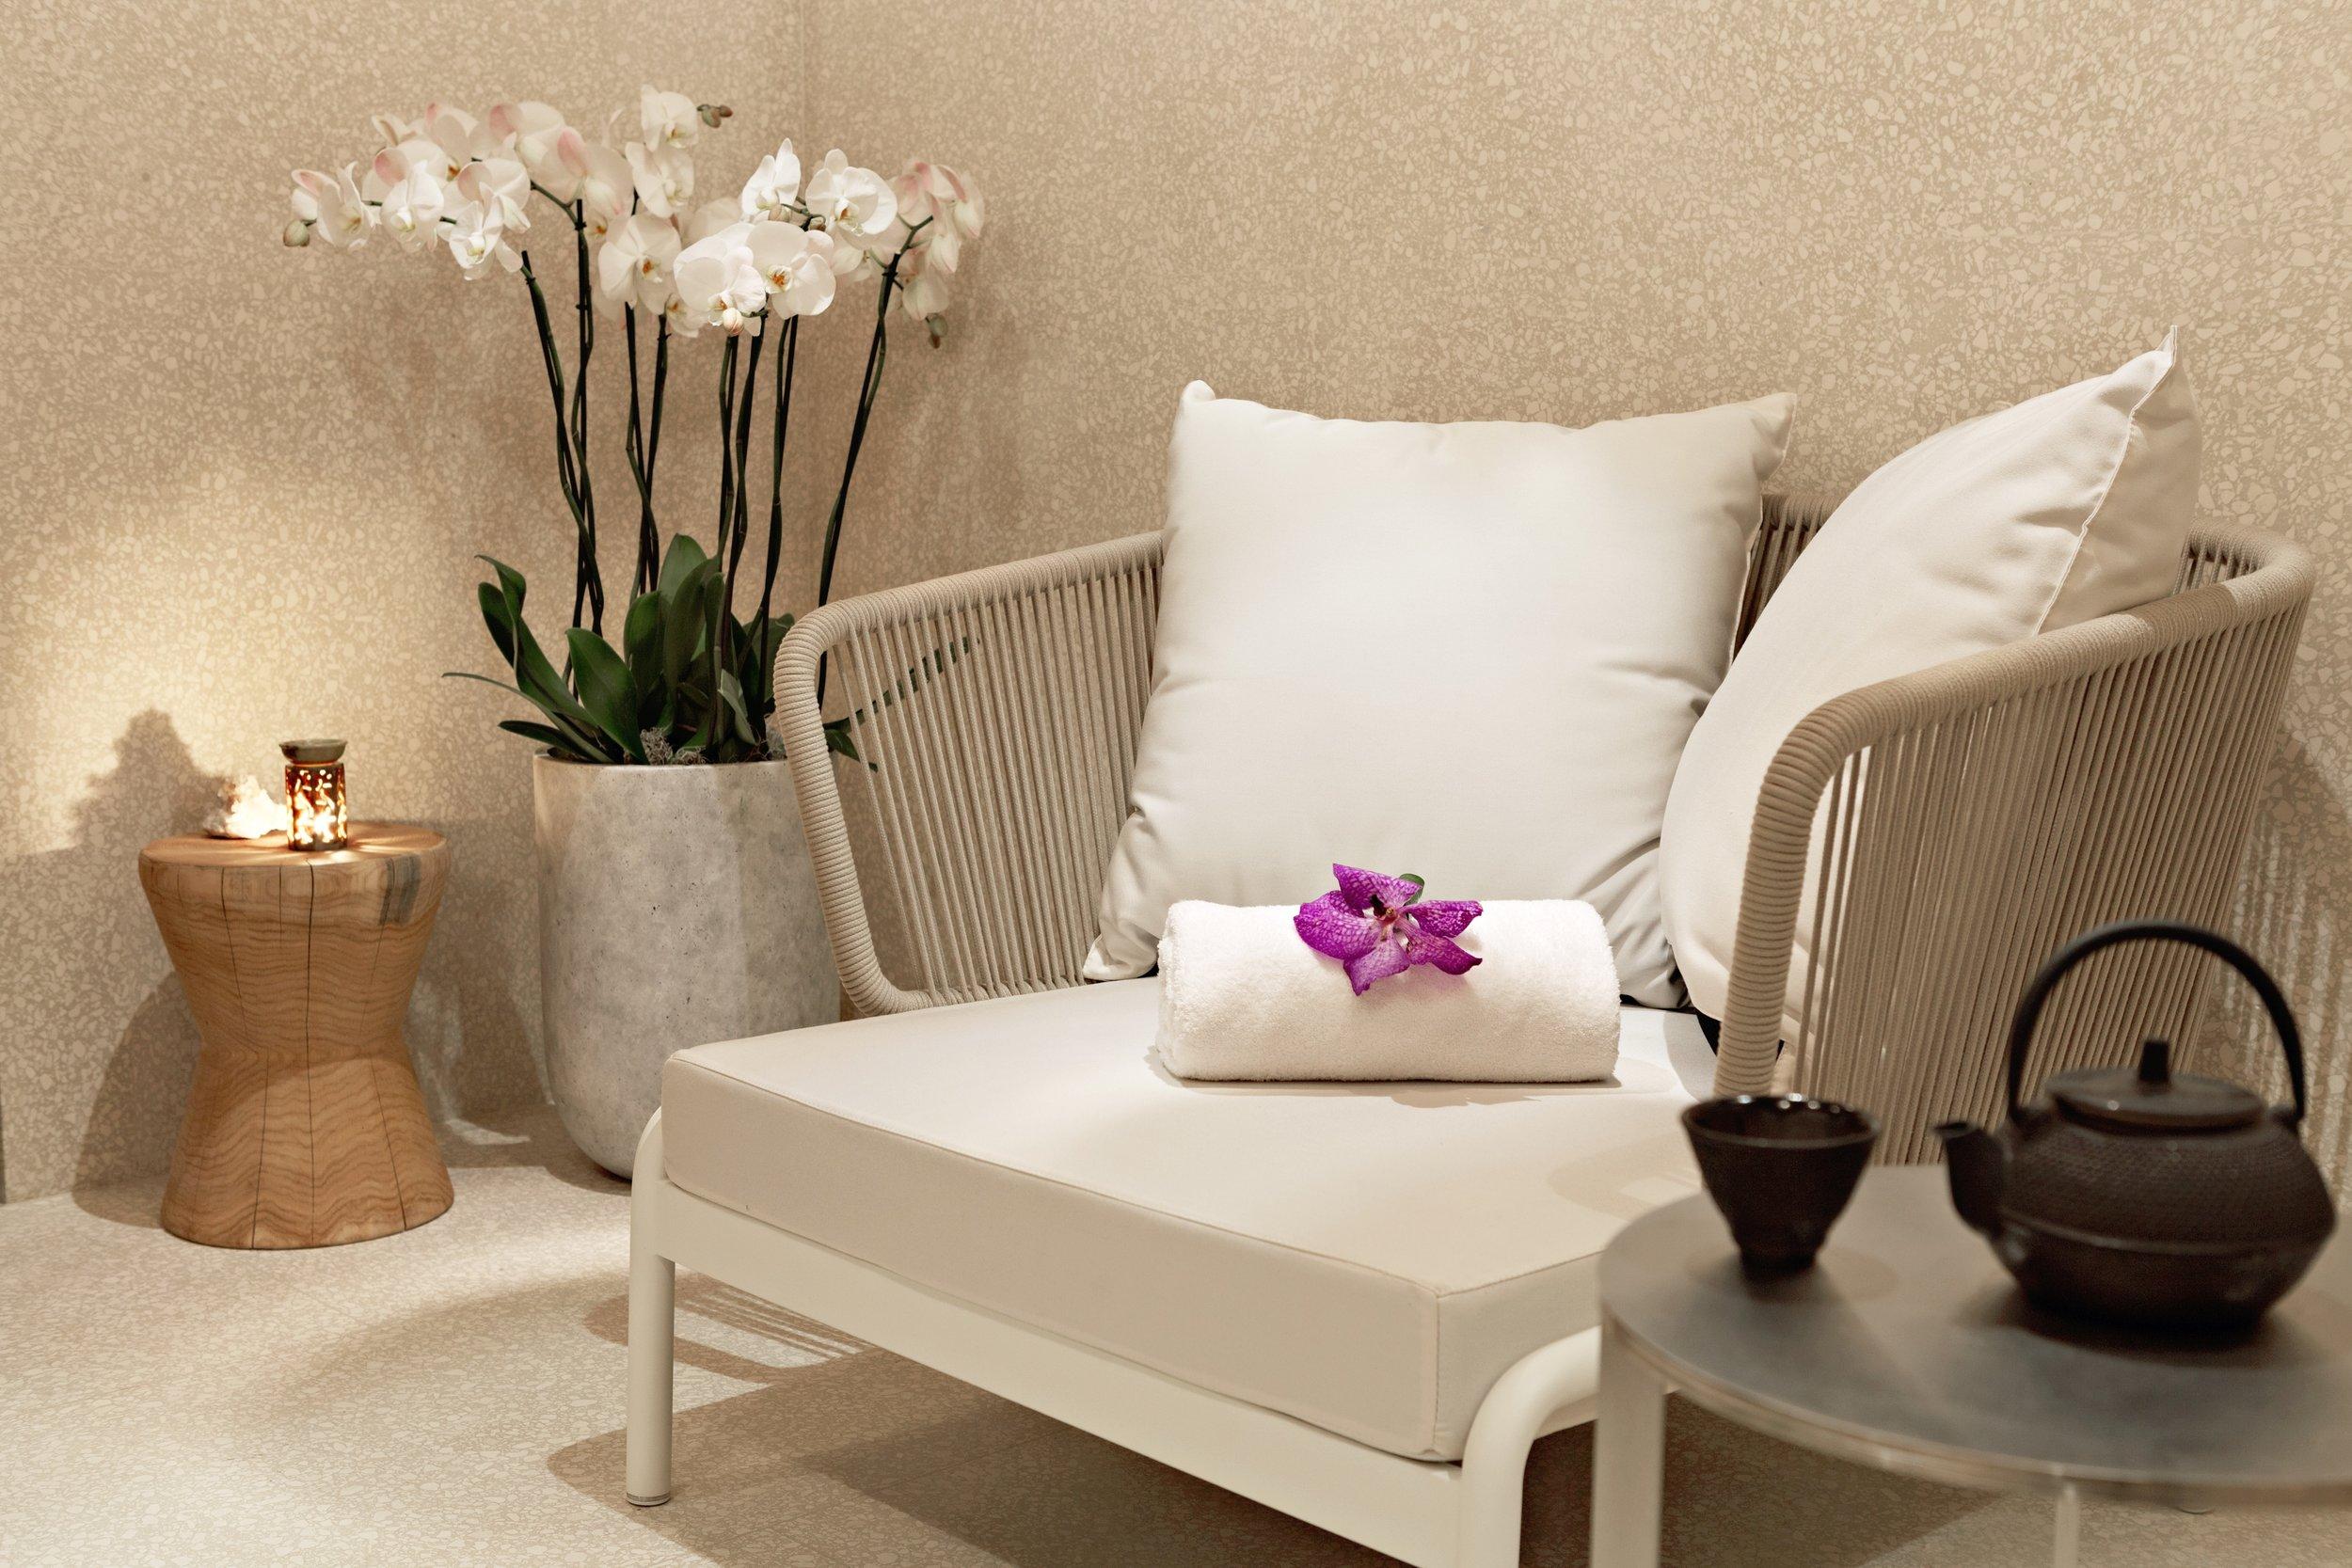 Hotel Cafe Royal - Akasha - Pre Treatment Room.jpg